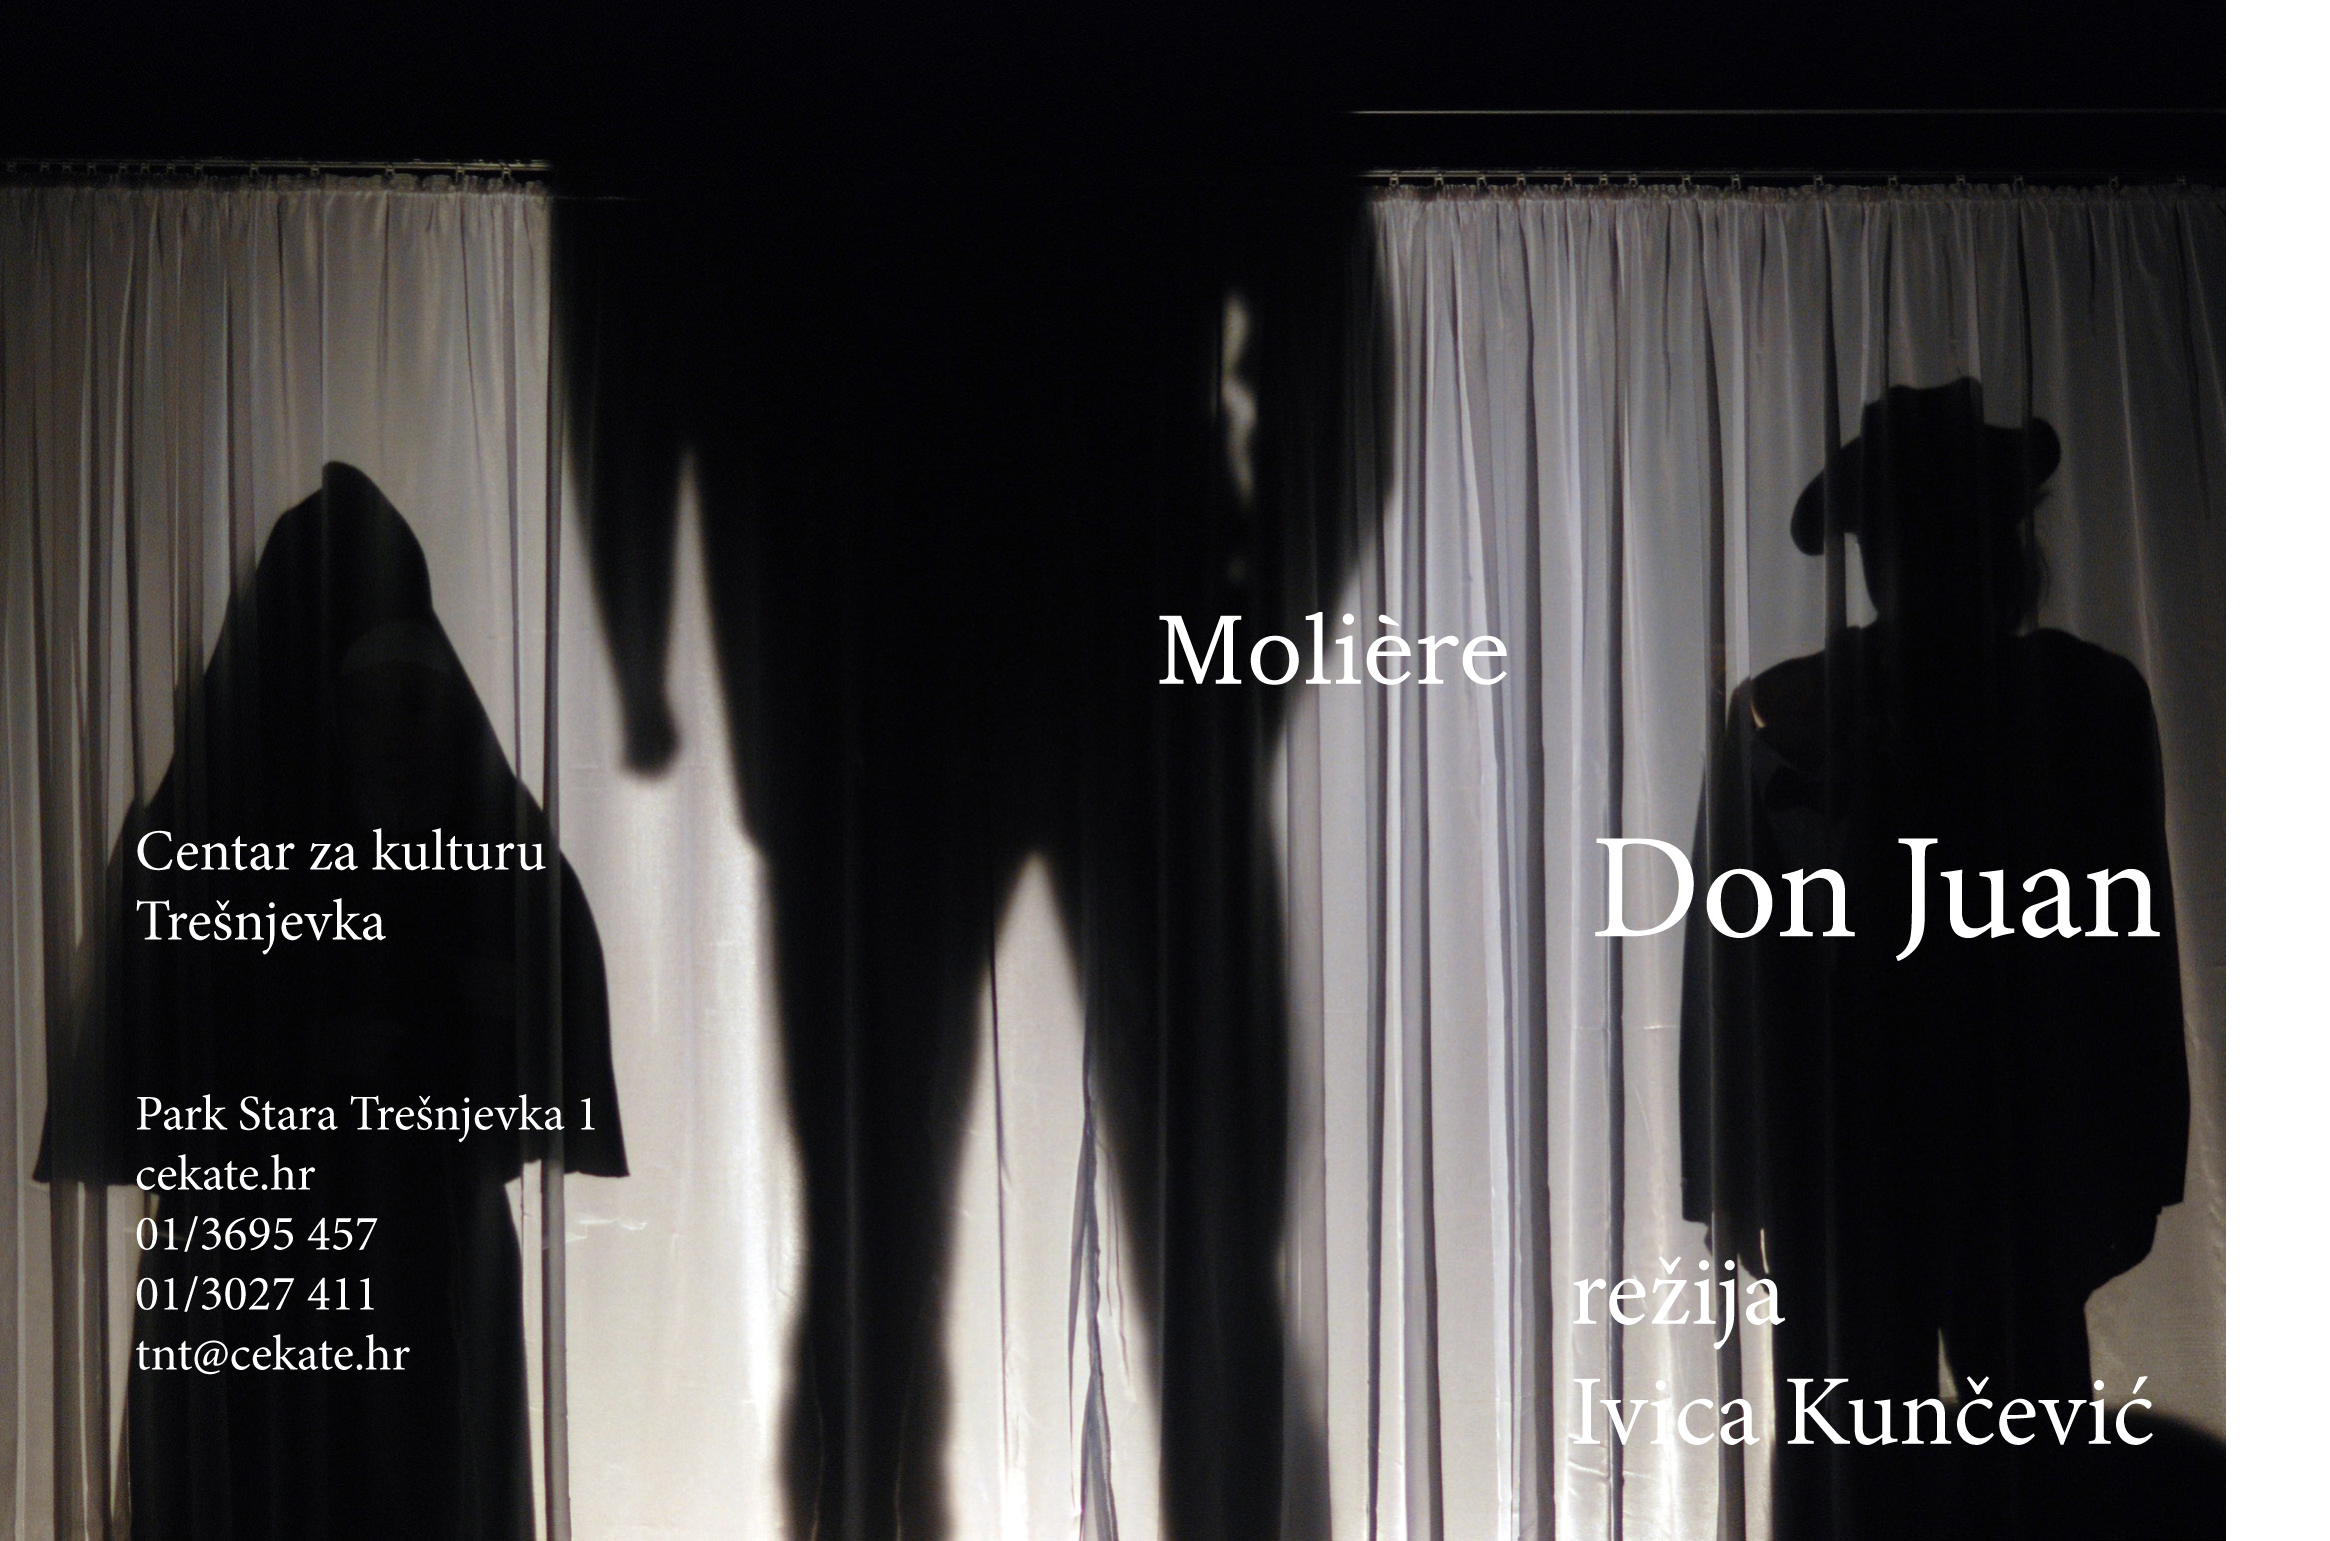 PREMIJERA / Molière: Don Juan / režija Ivica Kunčević / 20:00 / 23. 11. / reprize 30. 11. / 2. i 11. 12